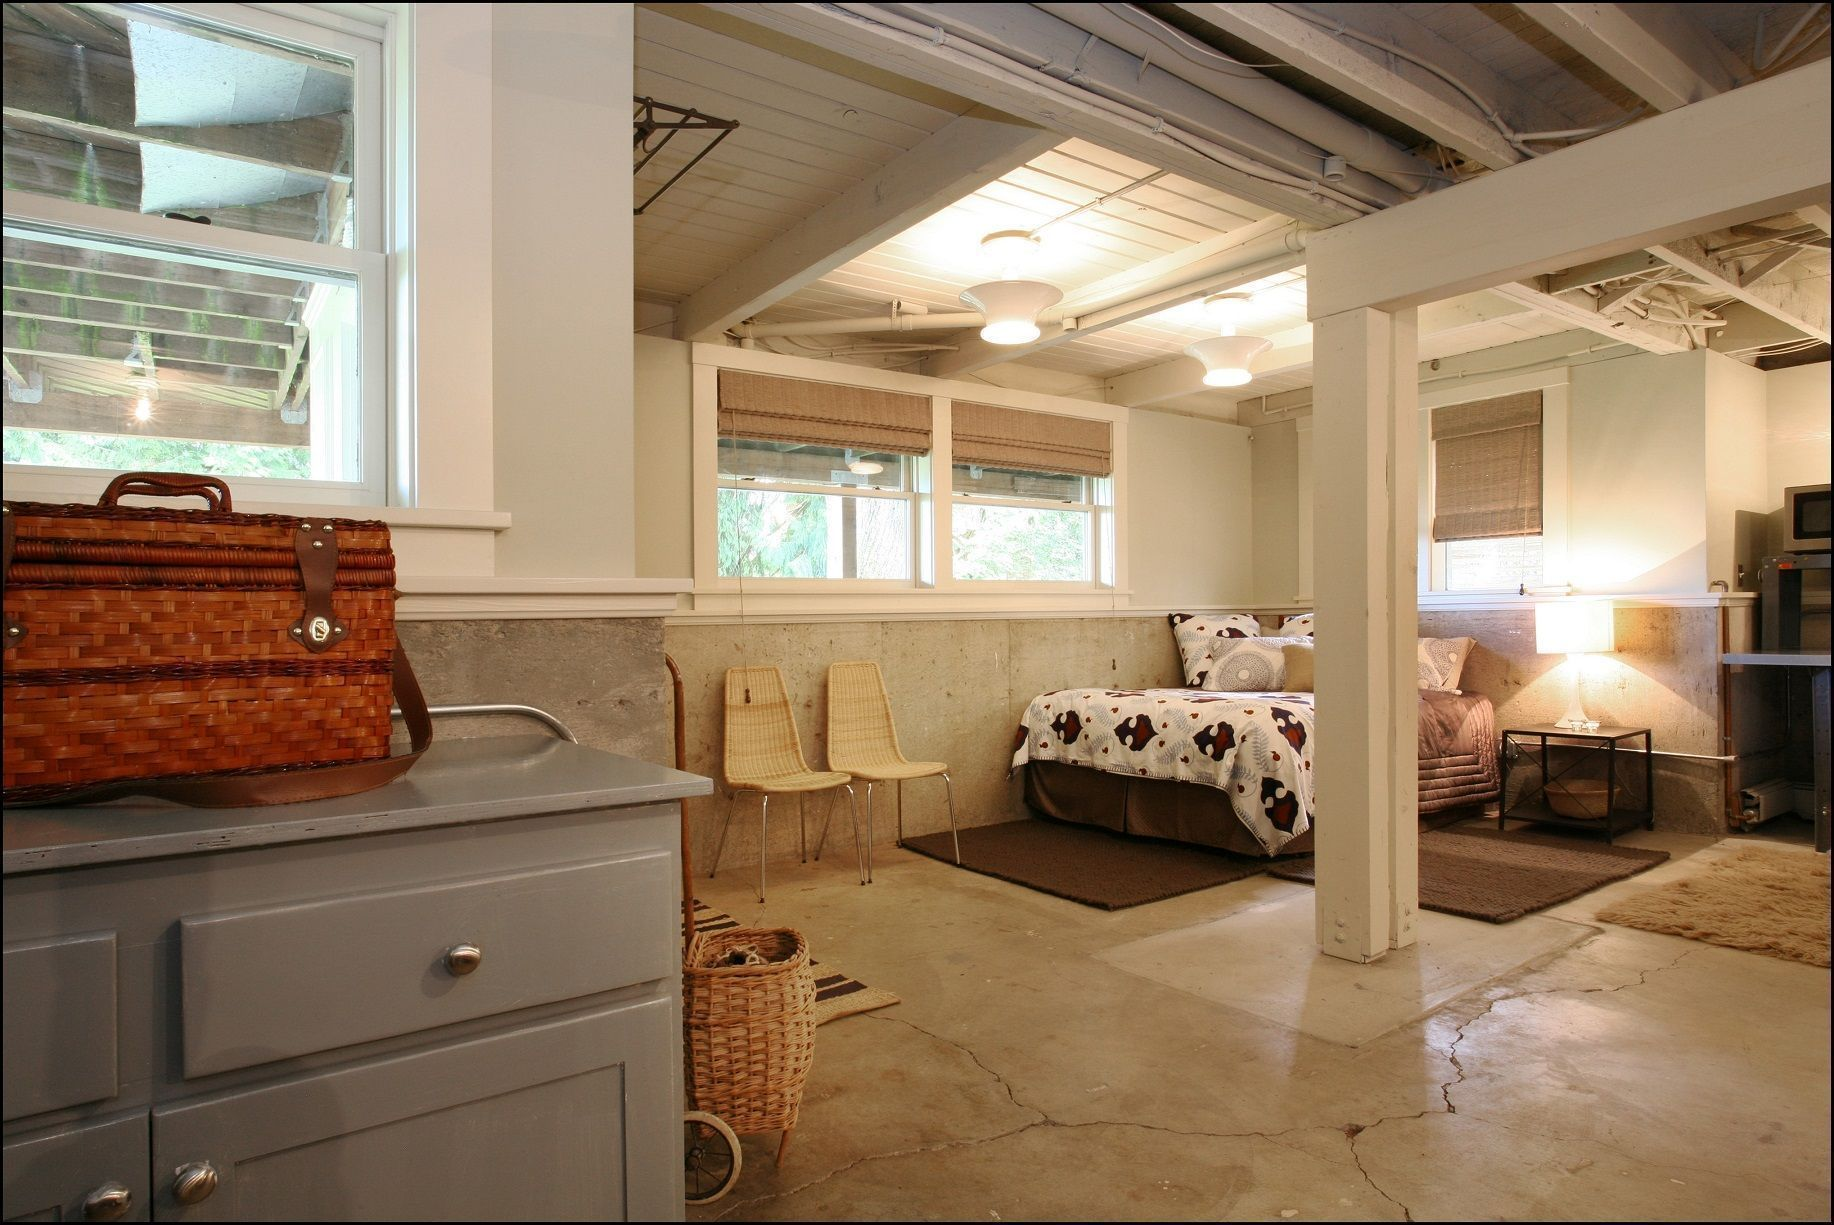 Cool Basement Bathroom Ideas - Small Basement Bathroom Floor Plans